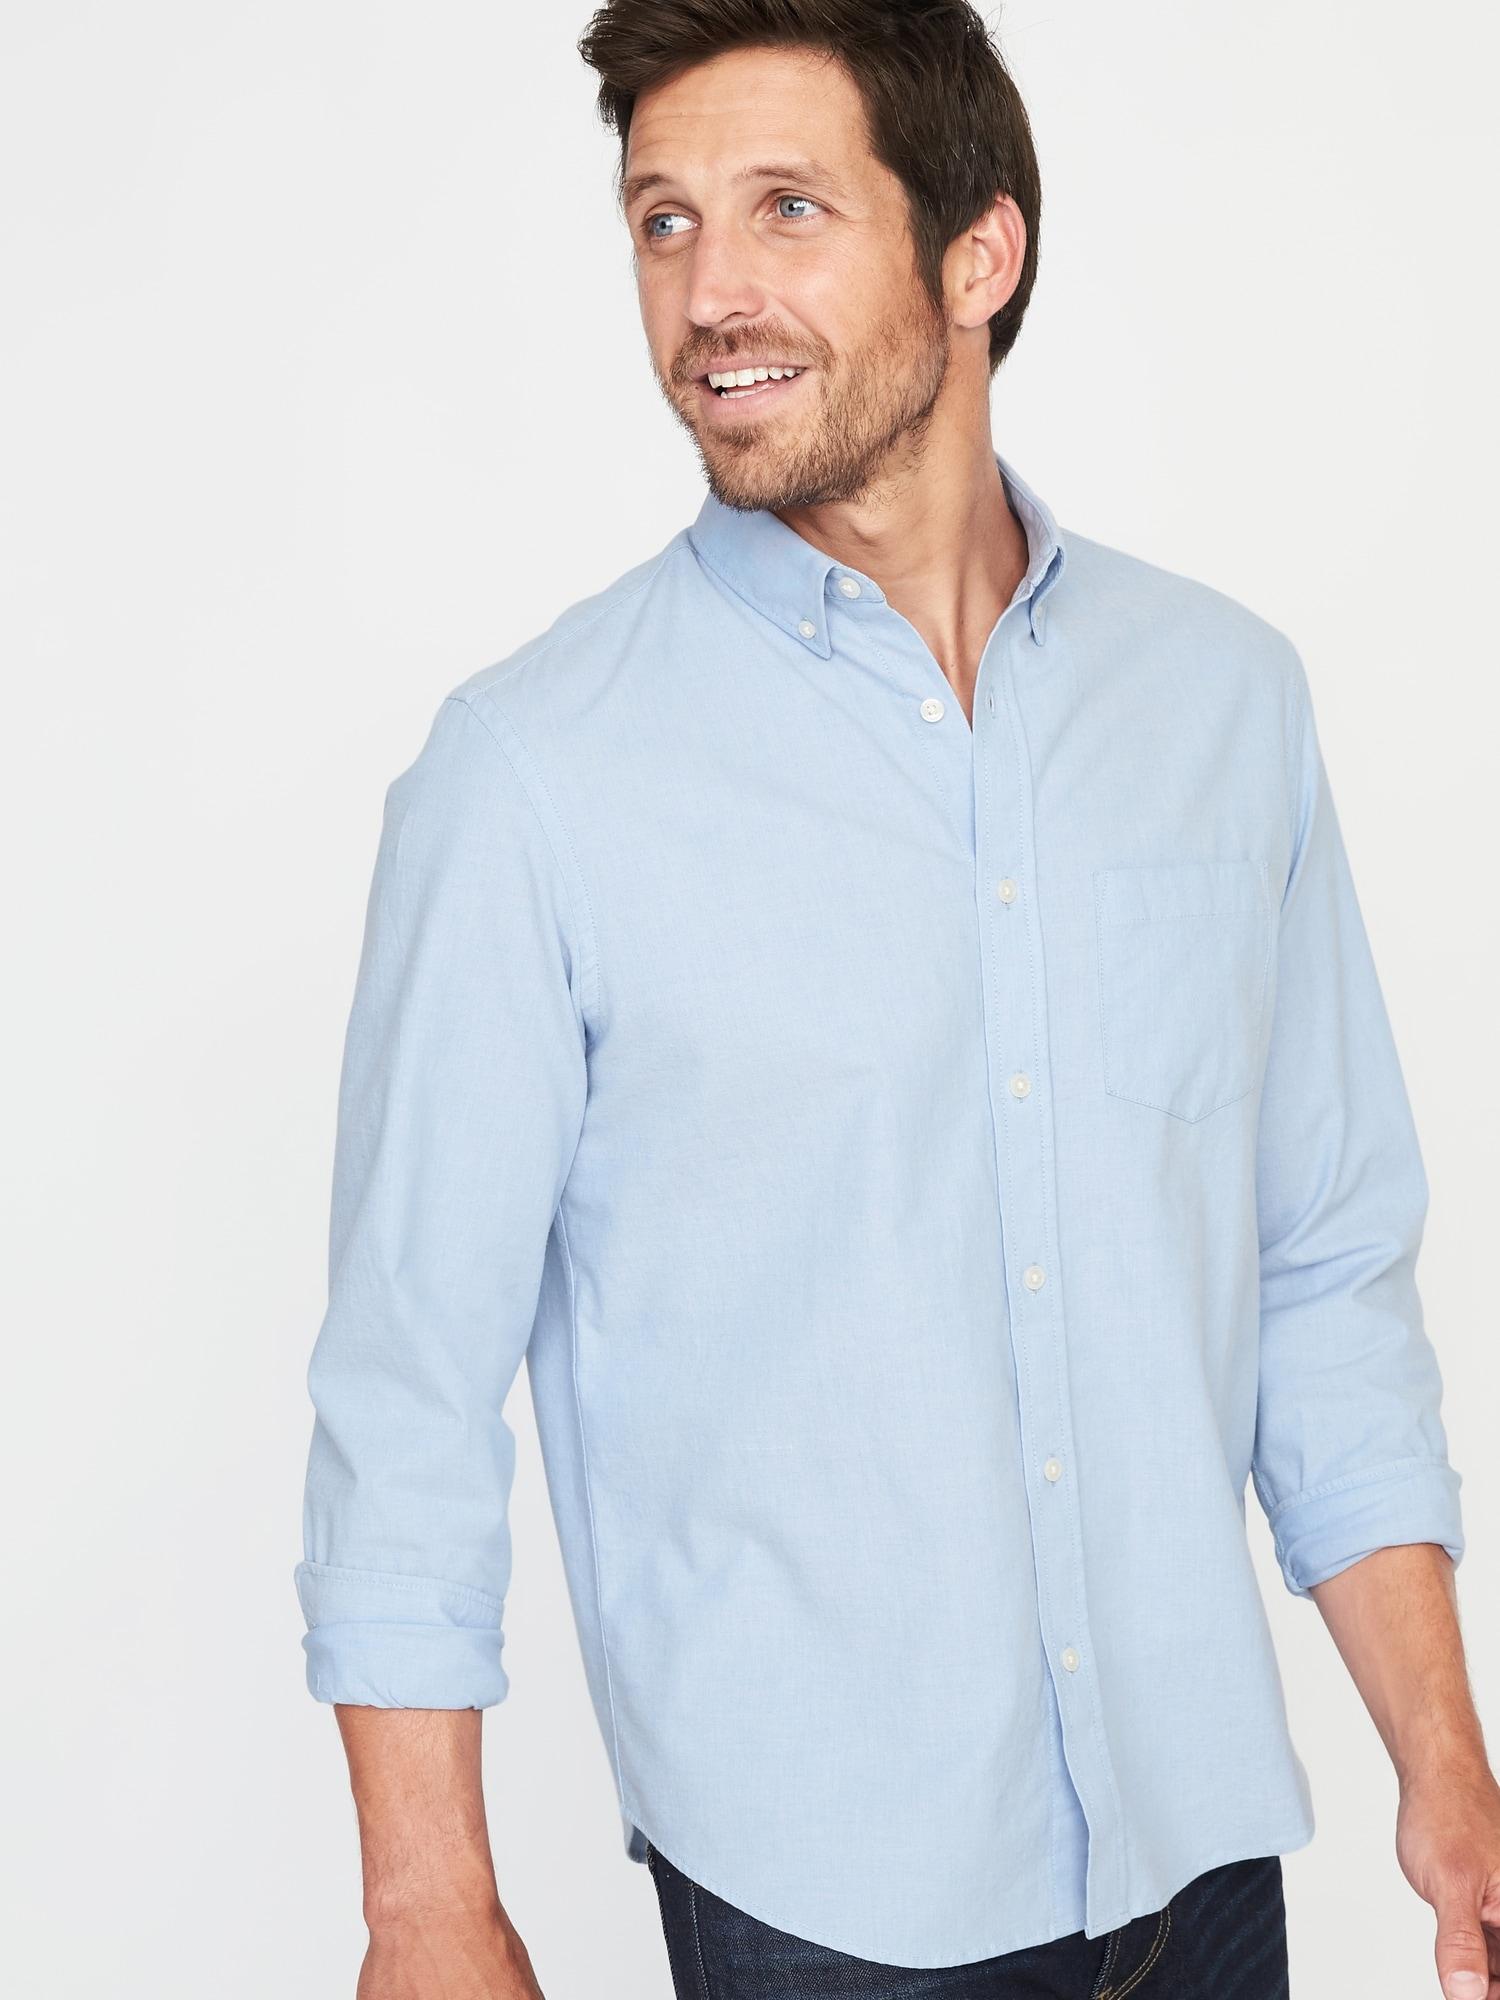 adfd9e9a9f5 Regular-Fit Built-In Flex Everyday Oxford Shirt for Men